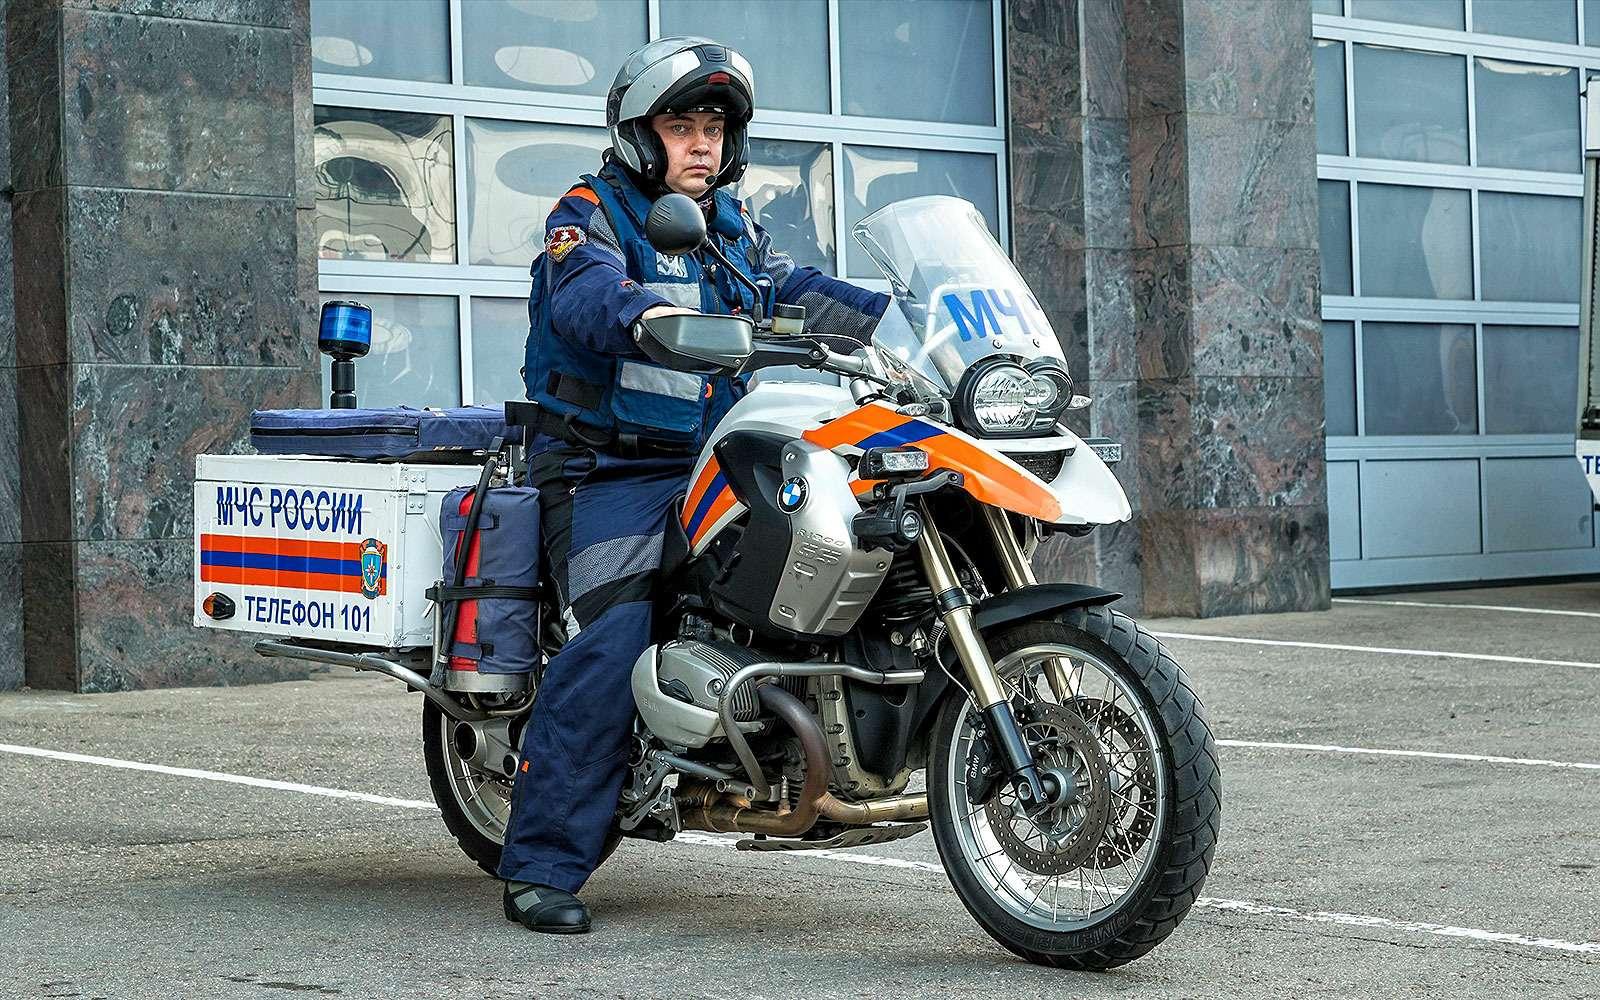 Мотоциклист МЧС